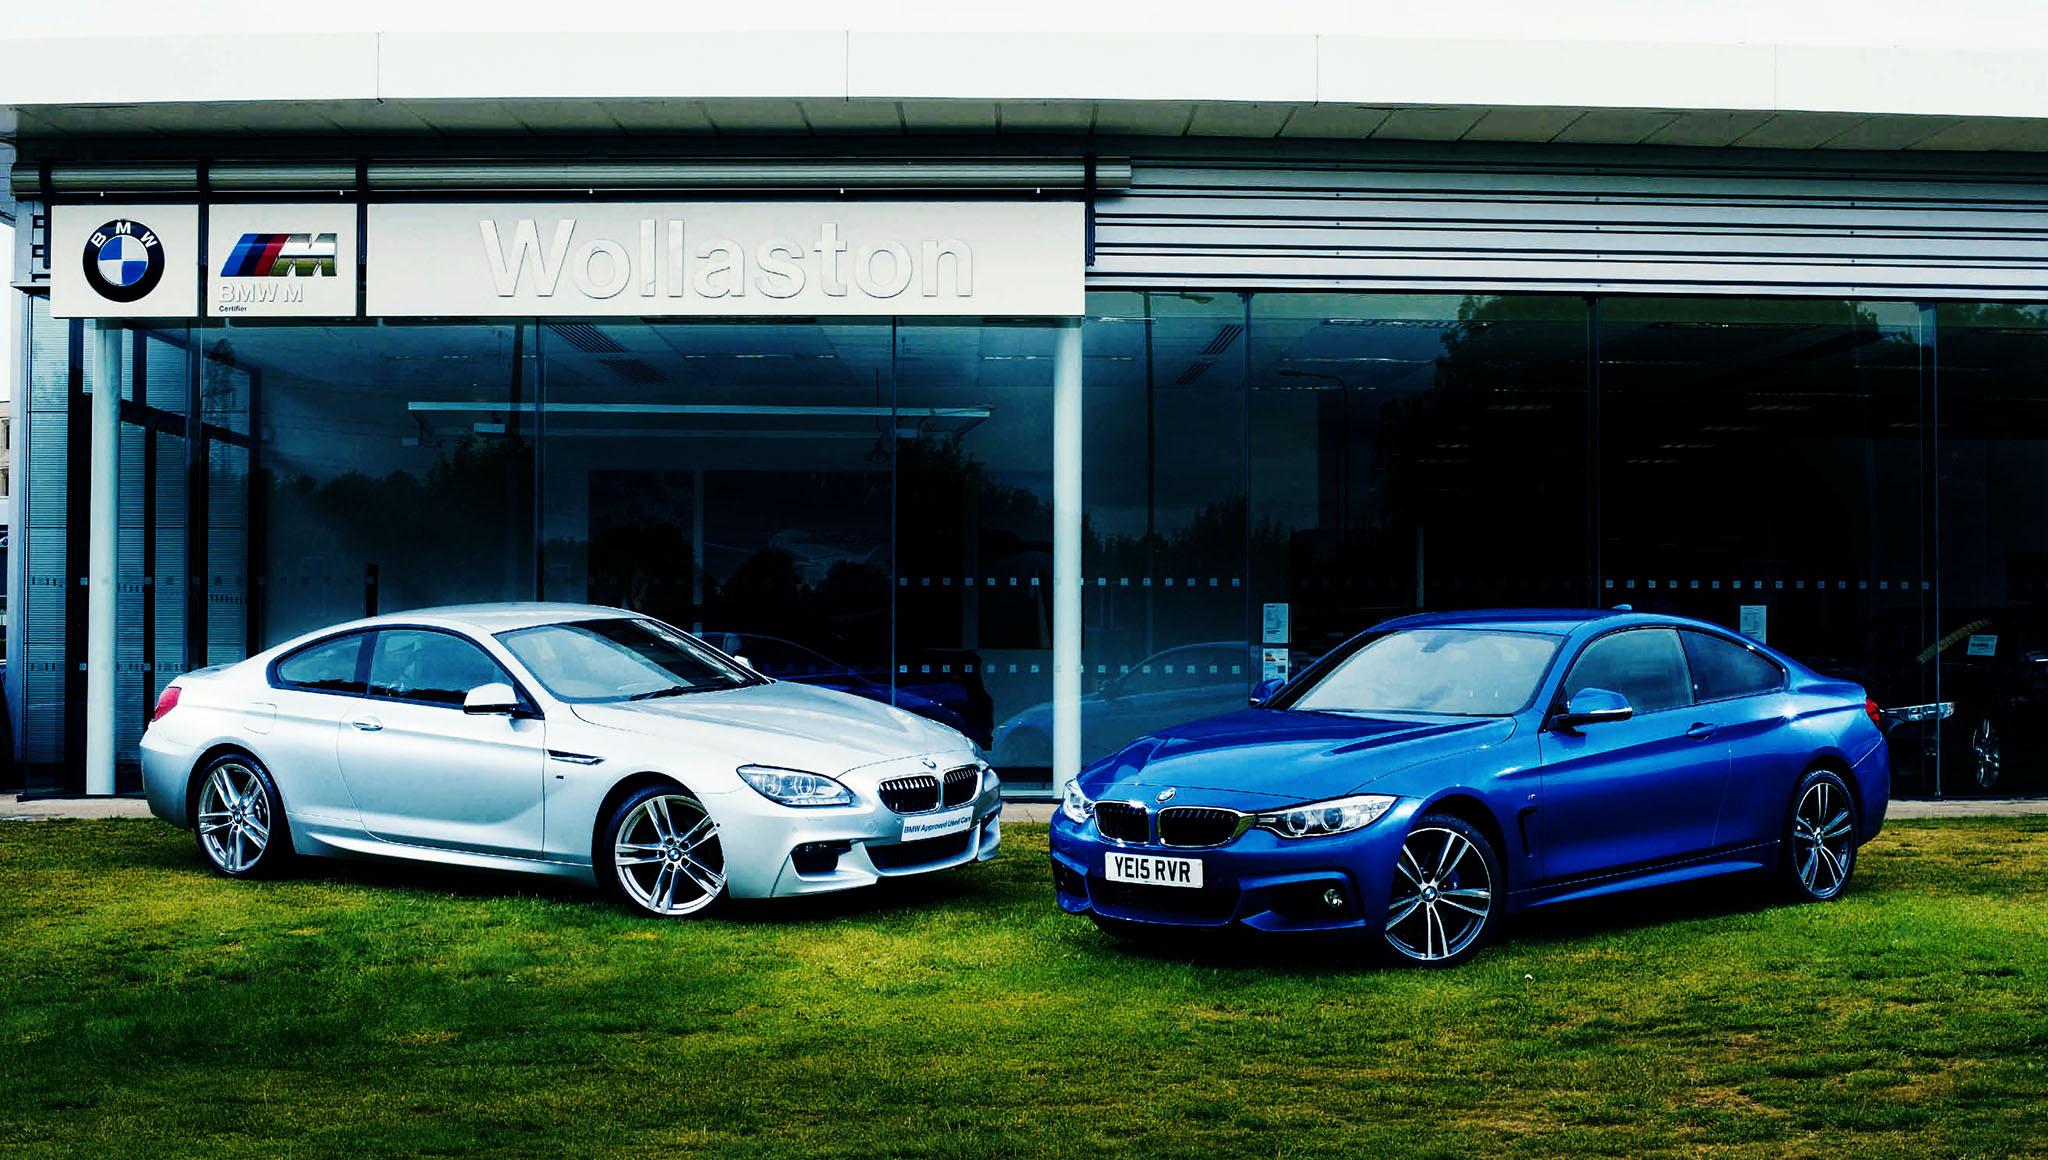 Used vs. new - 2015 BMW 420d Coupé F32 vs. 2012 BMW 640d F13 - Drive ...